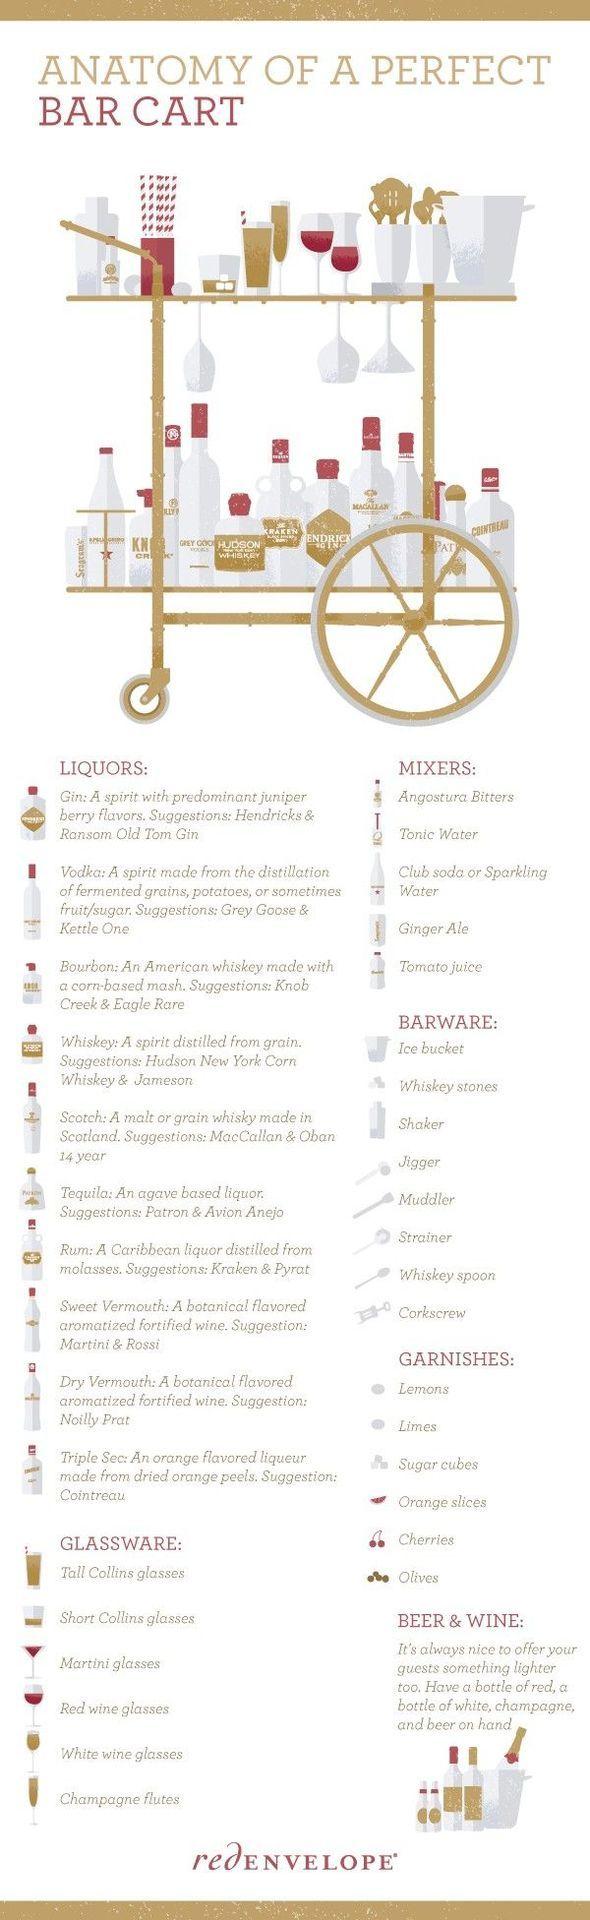 Anatomy of a Bar Cart